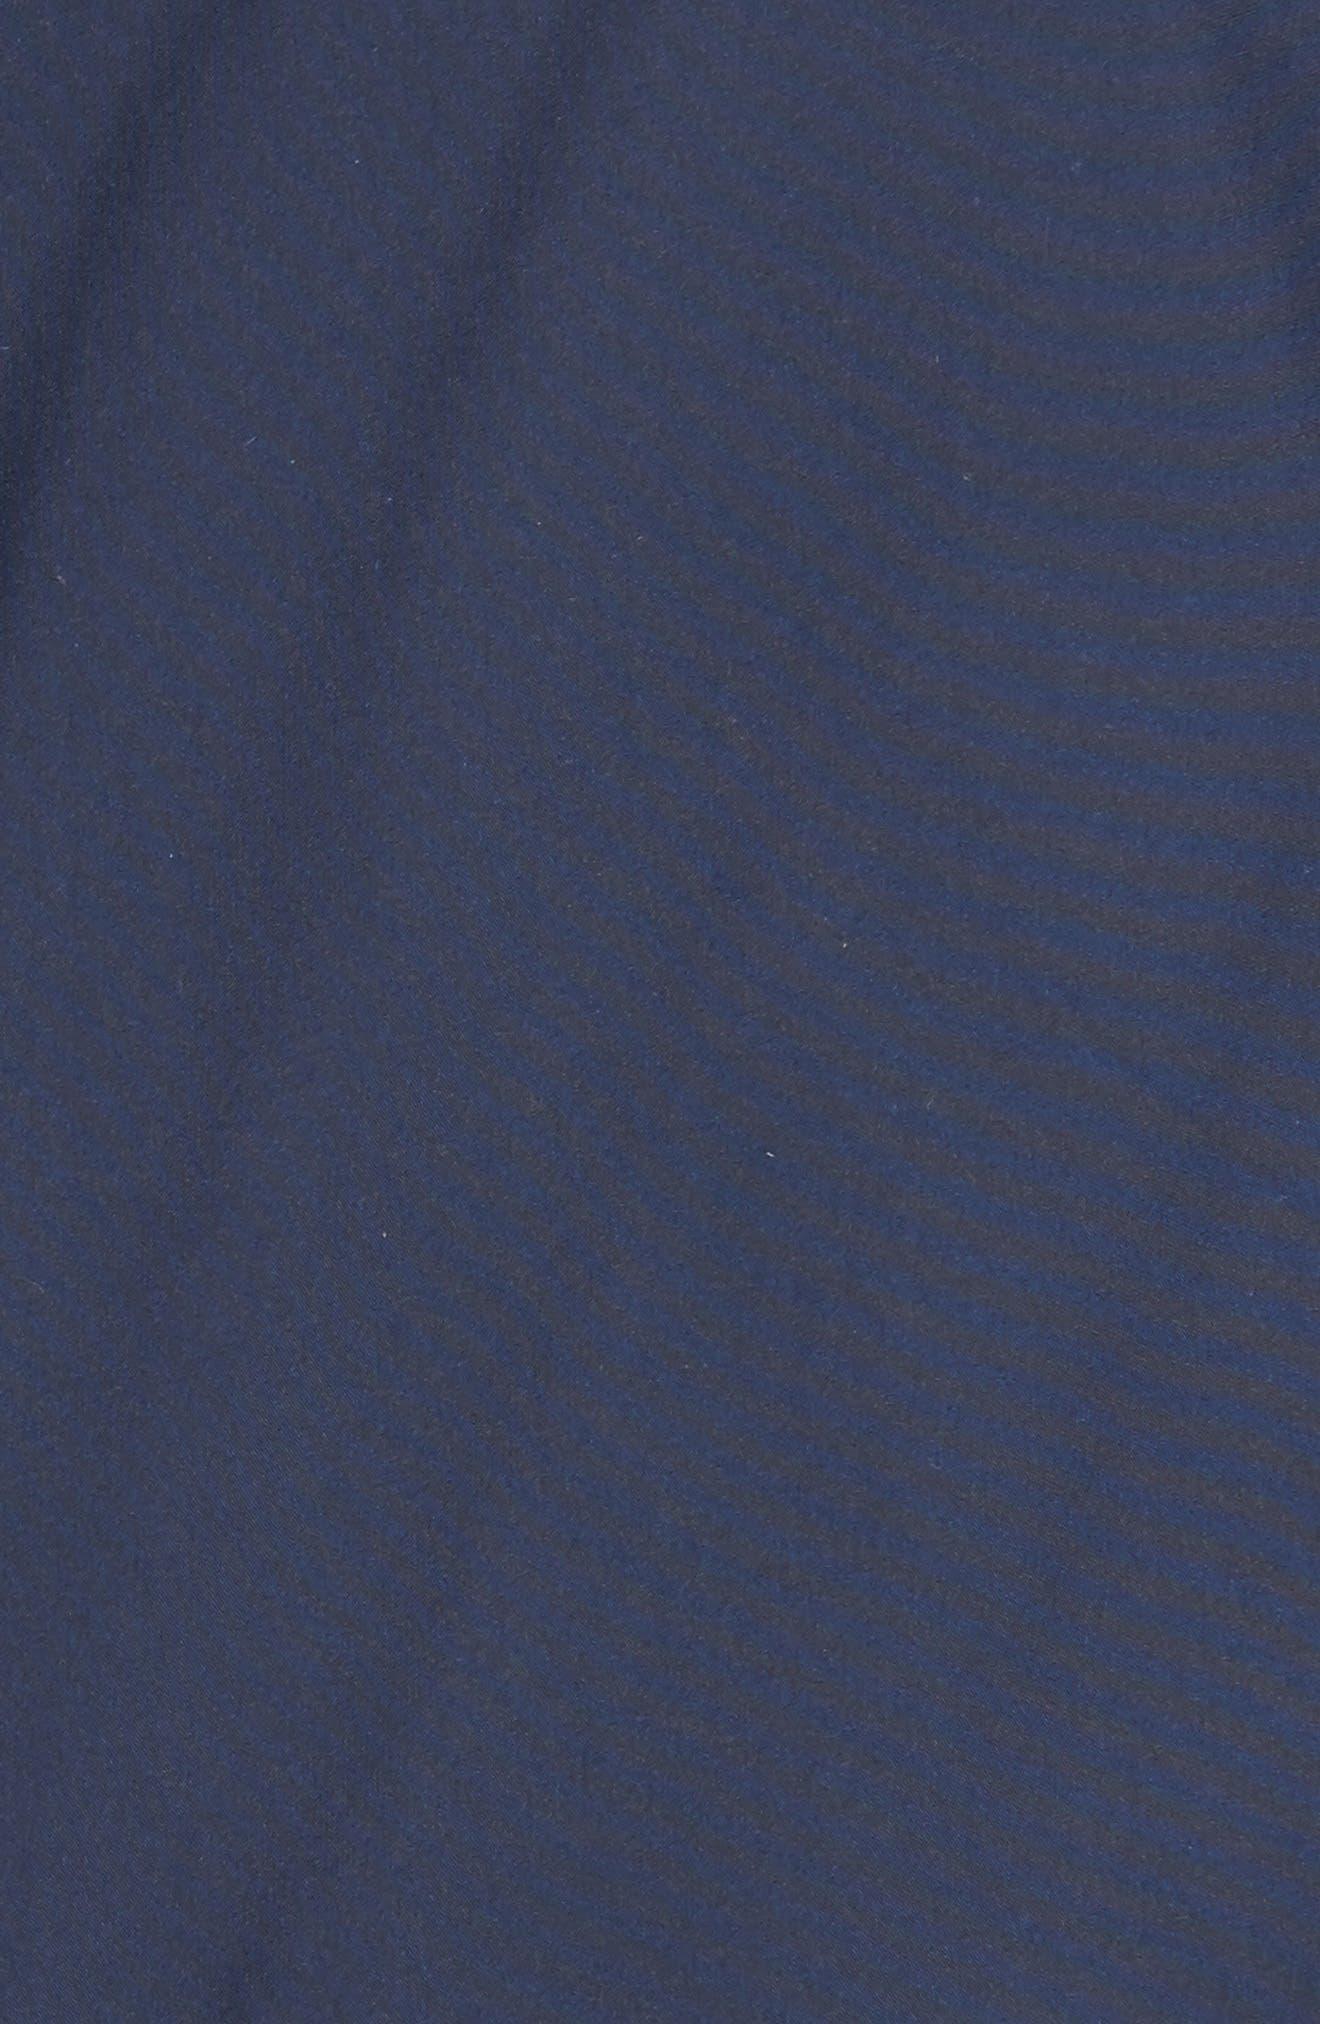 Shield Coach's Jacket,                             Alternate thumbnail 5, color,                             Obsidian